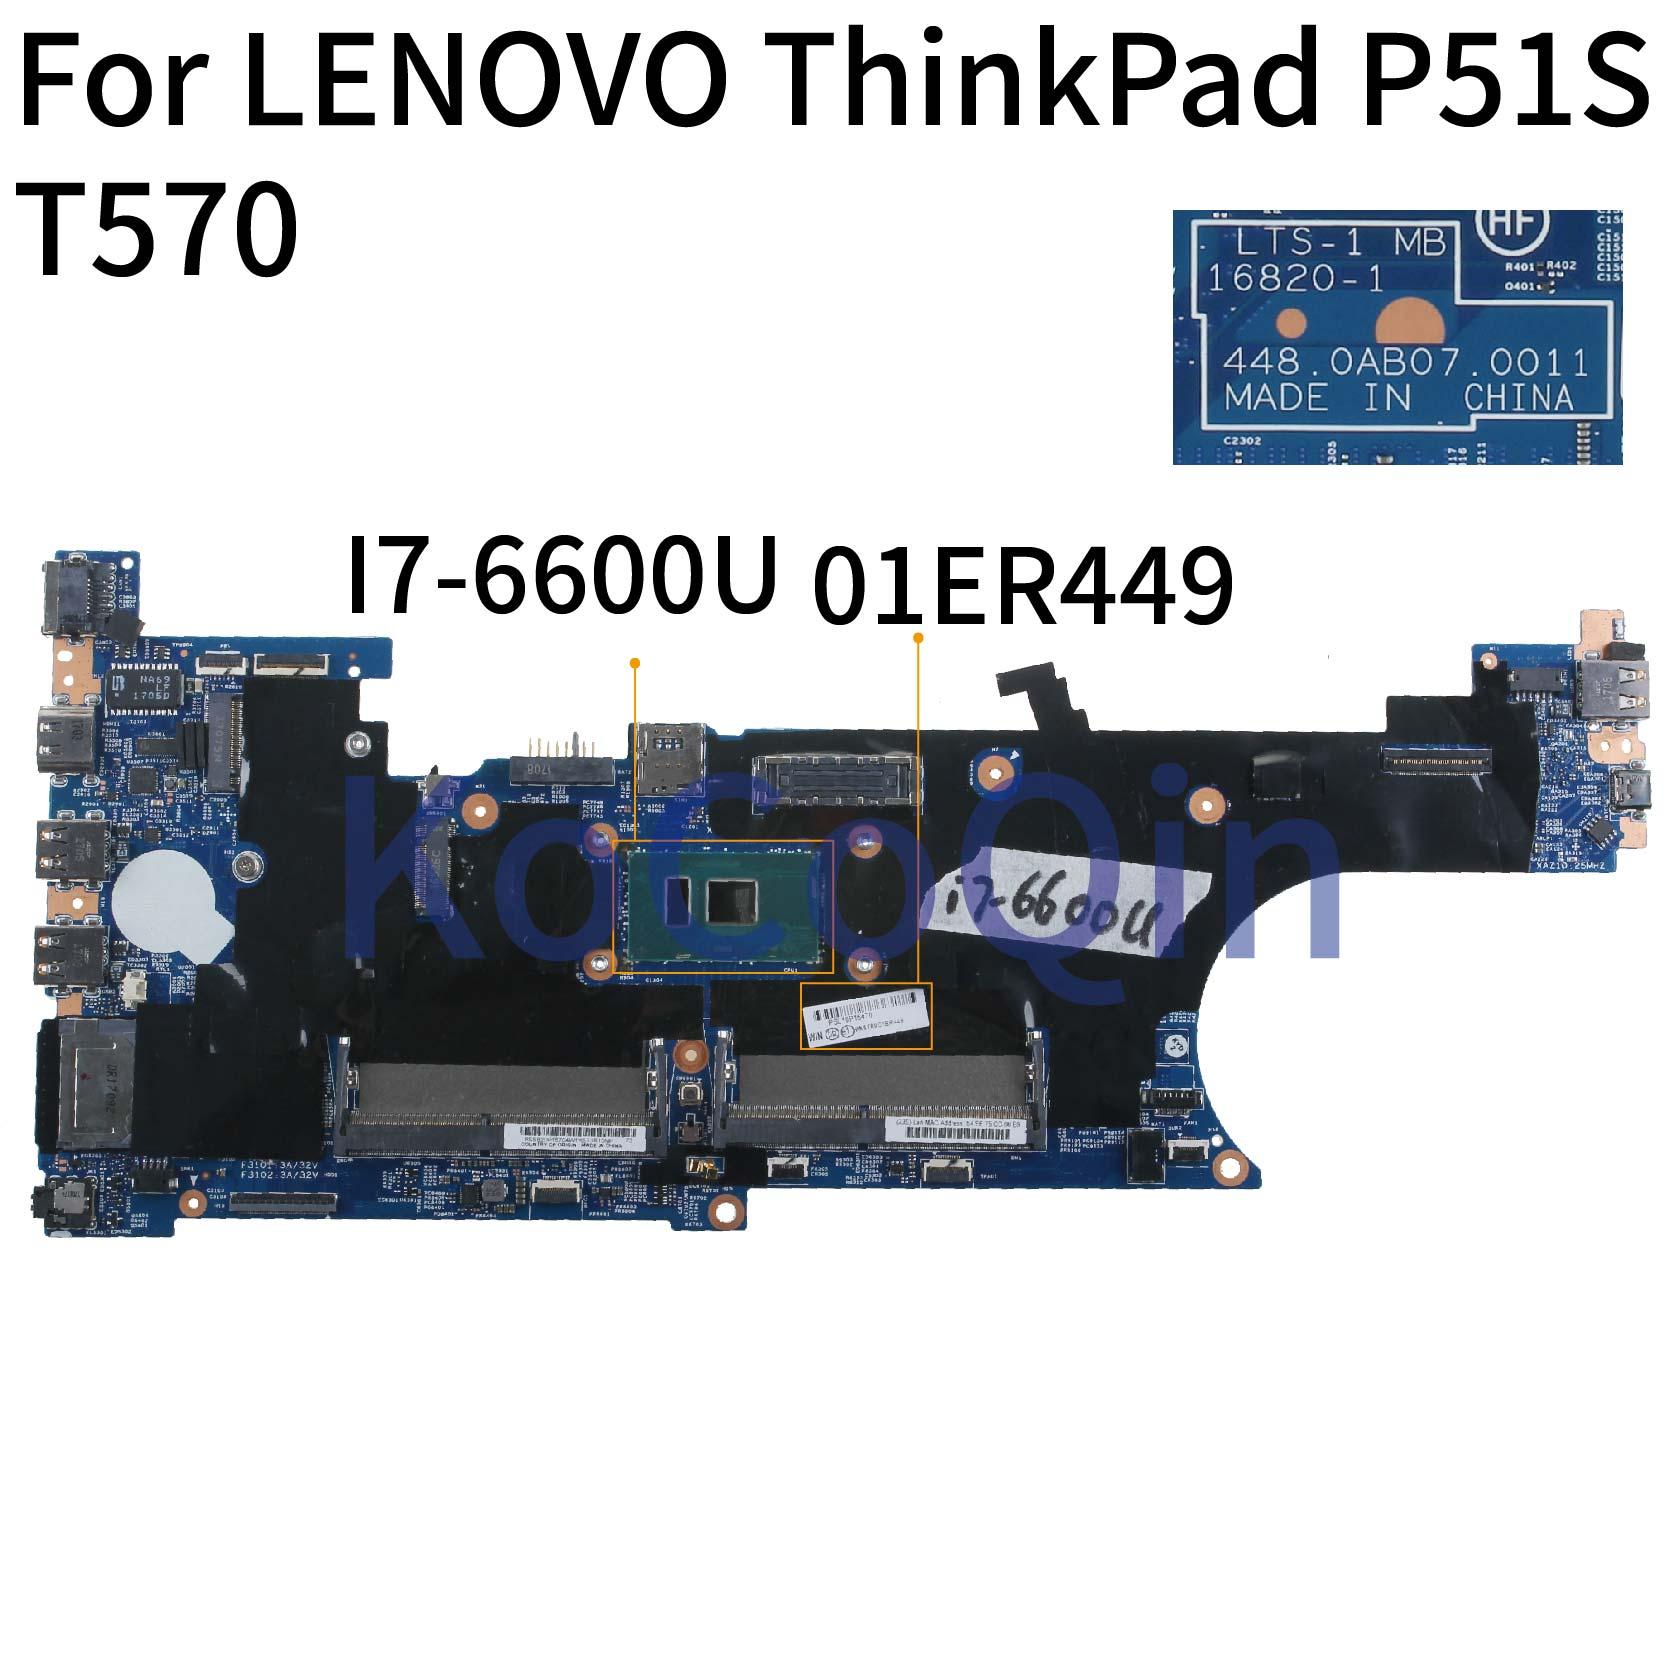 KoCoQin اللوحة لابتوب لينوفو ثينك باد P51S T570 I7-6600U اللوحة 01ER176 01ER449 16820-1 44.80AB07.0011 SR2F1